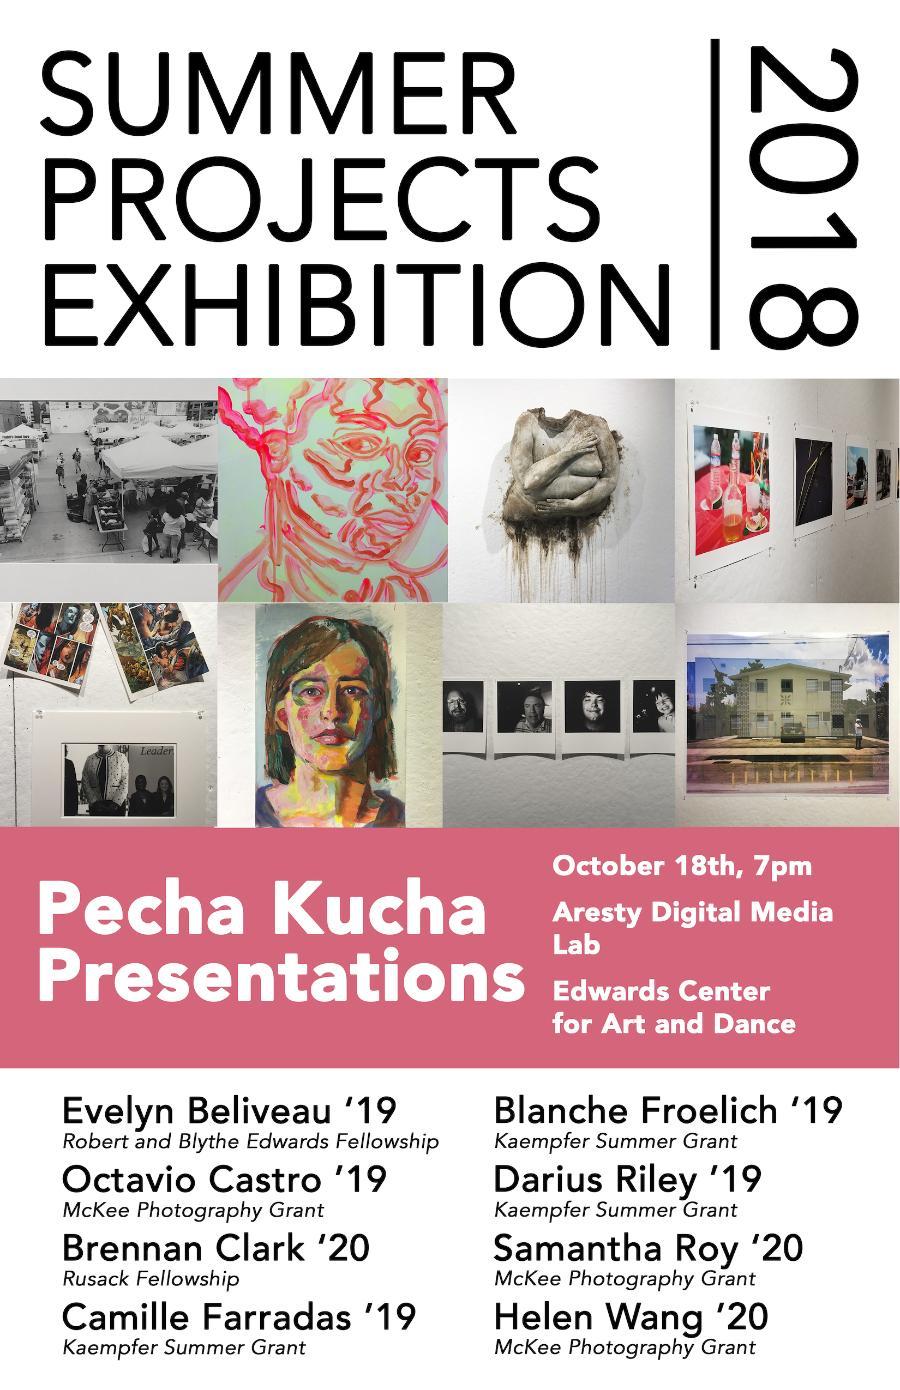 Pecha Kucha Night with McKee Photography Grant and Kaempfer Summer Art Grant Recipients